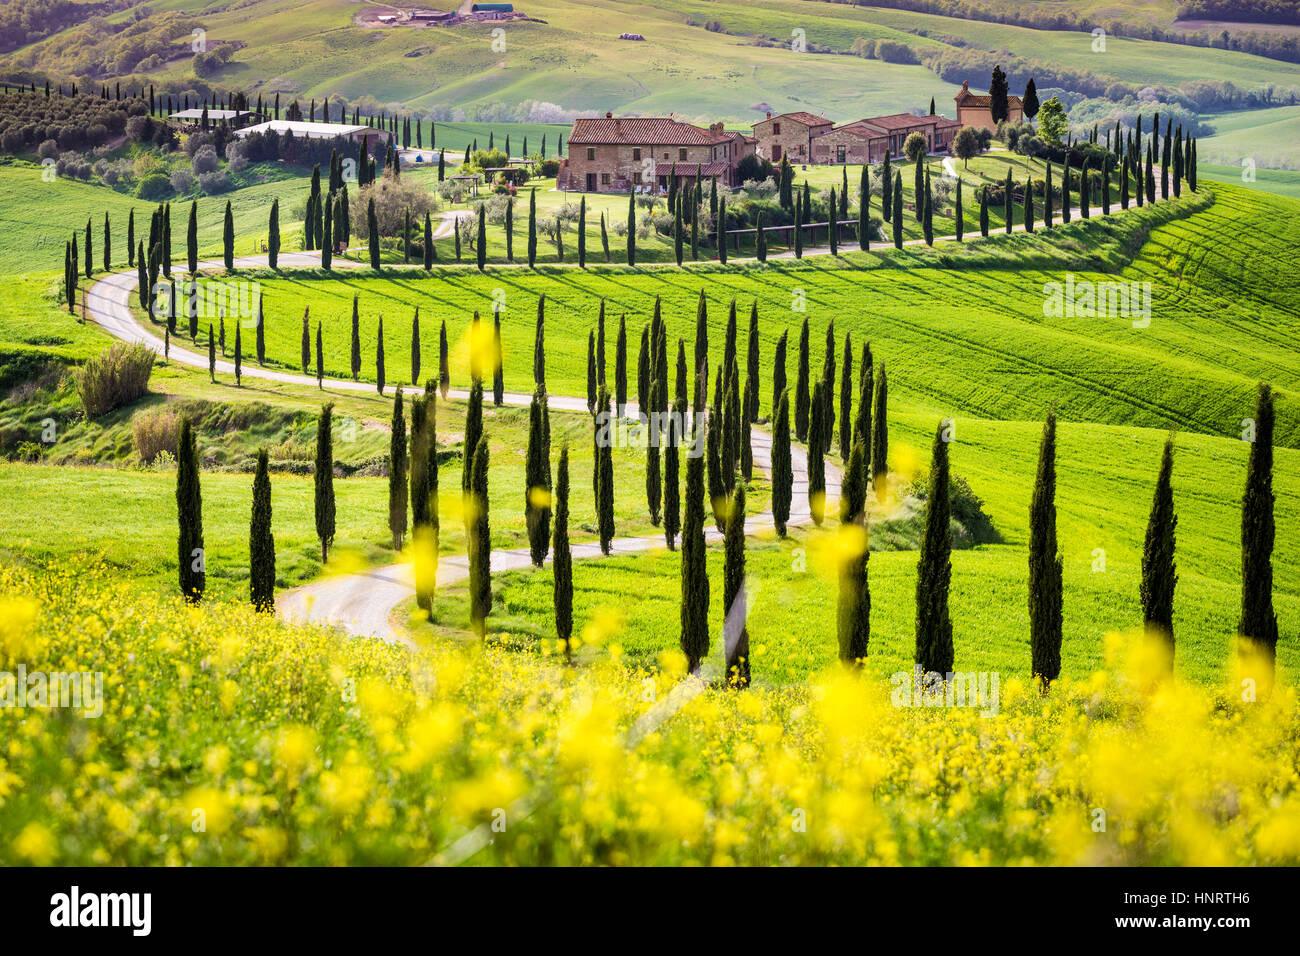 Asciano, cypress trees and rolling hills. Crete Senesi, Tuscany, Italy Stock Photo